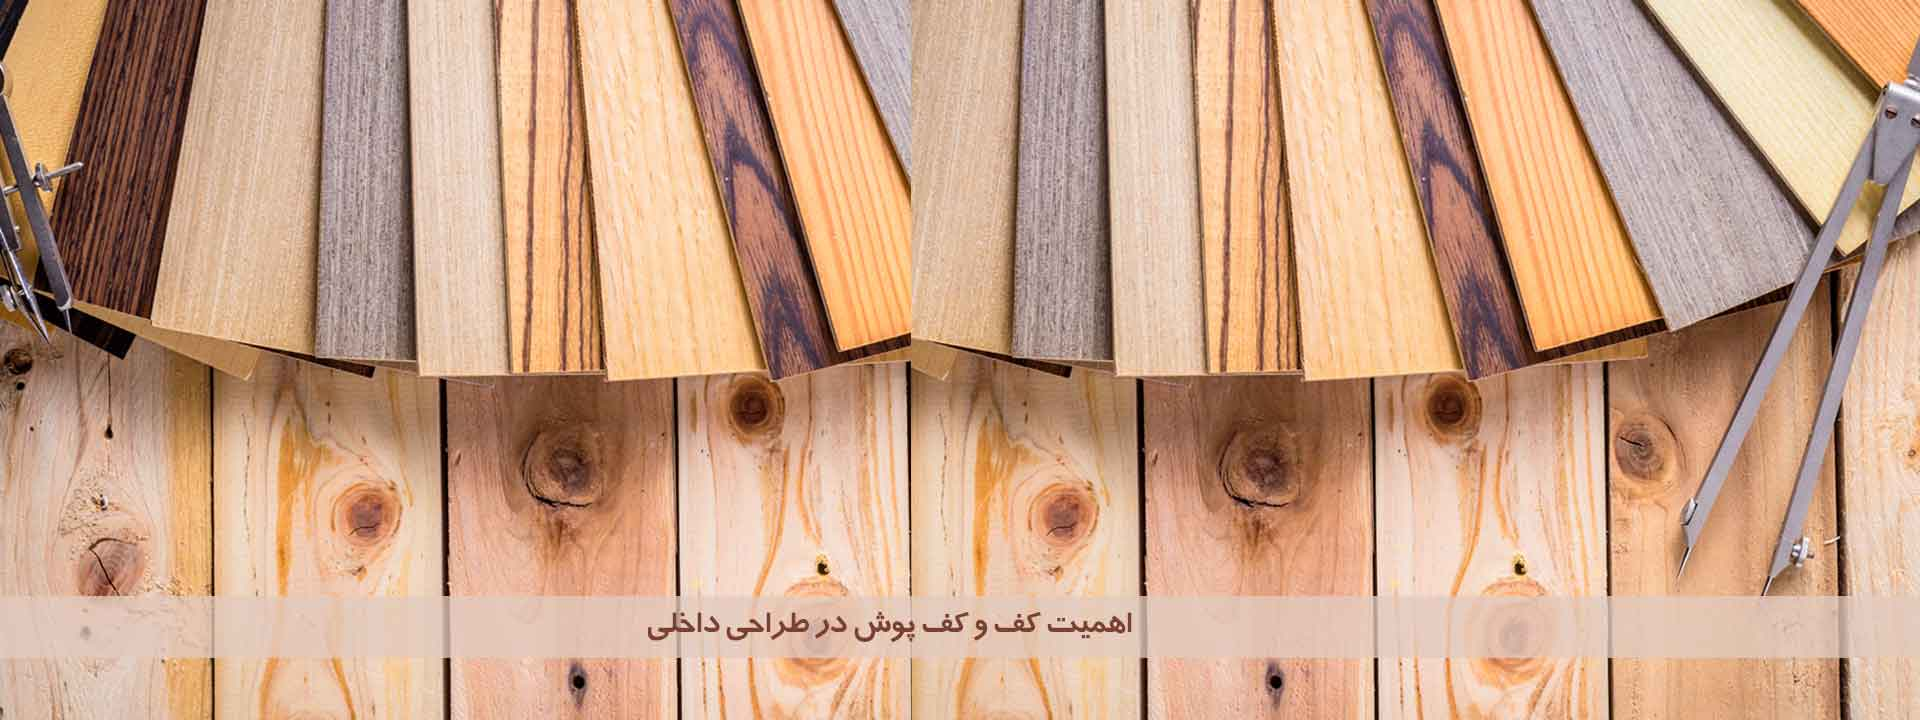 Floor Covering 002 - کف و کف پوش در طراحی داخلی